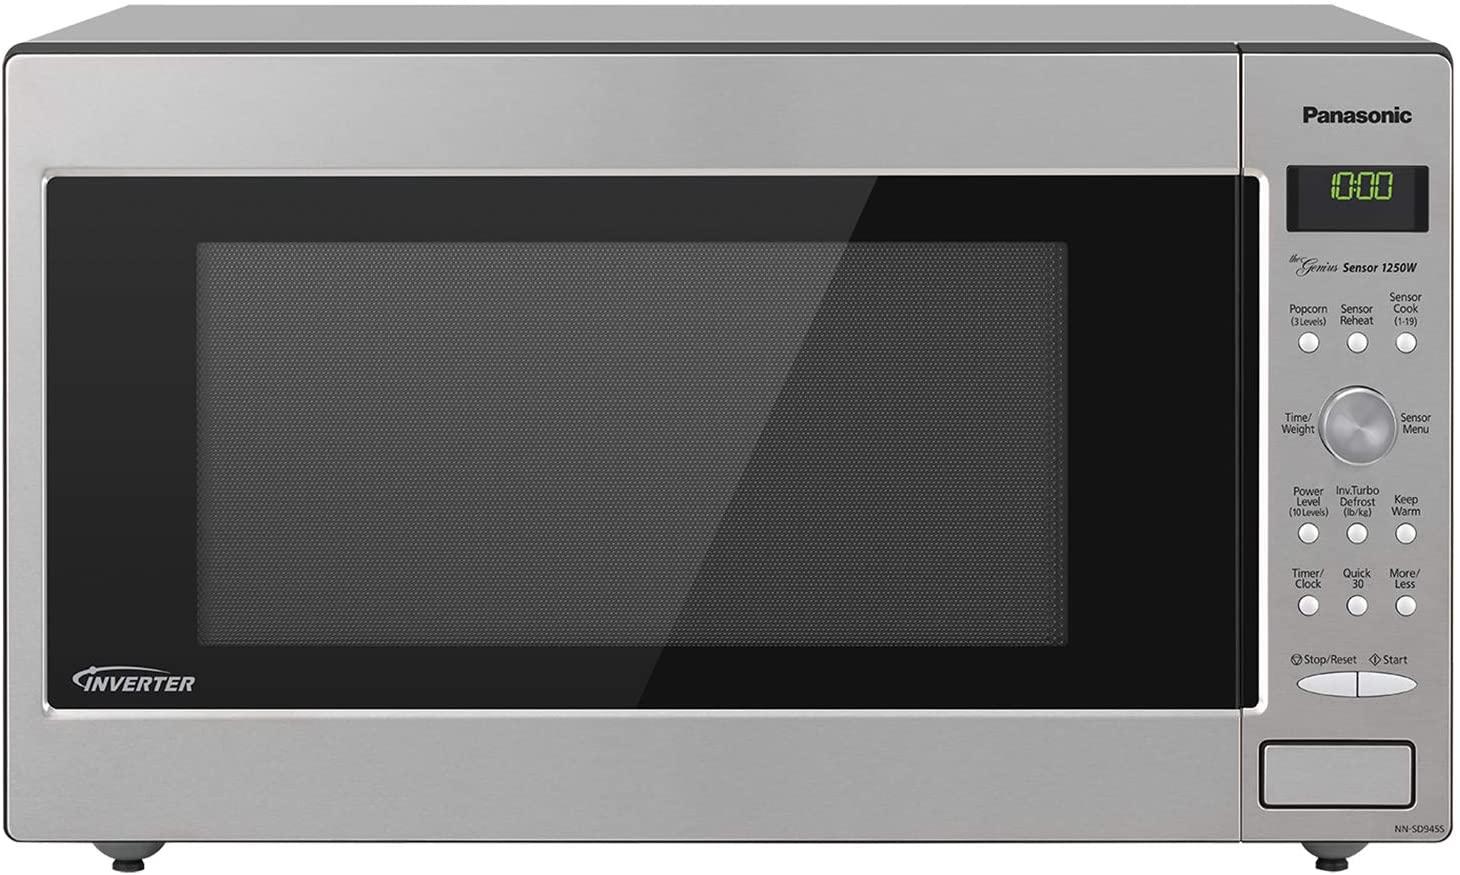 Panasonic NN-SD45S Countertop Microwave Oven